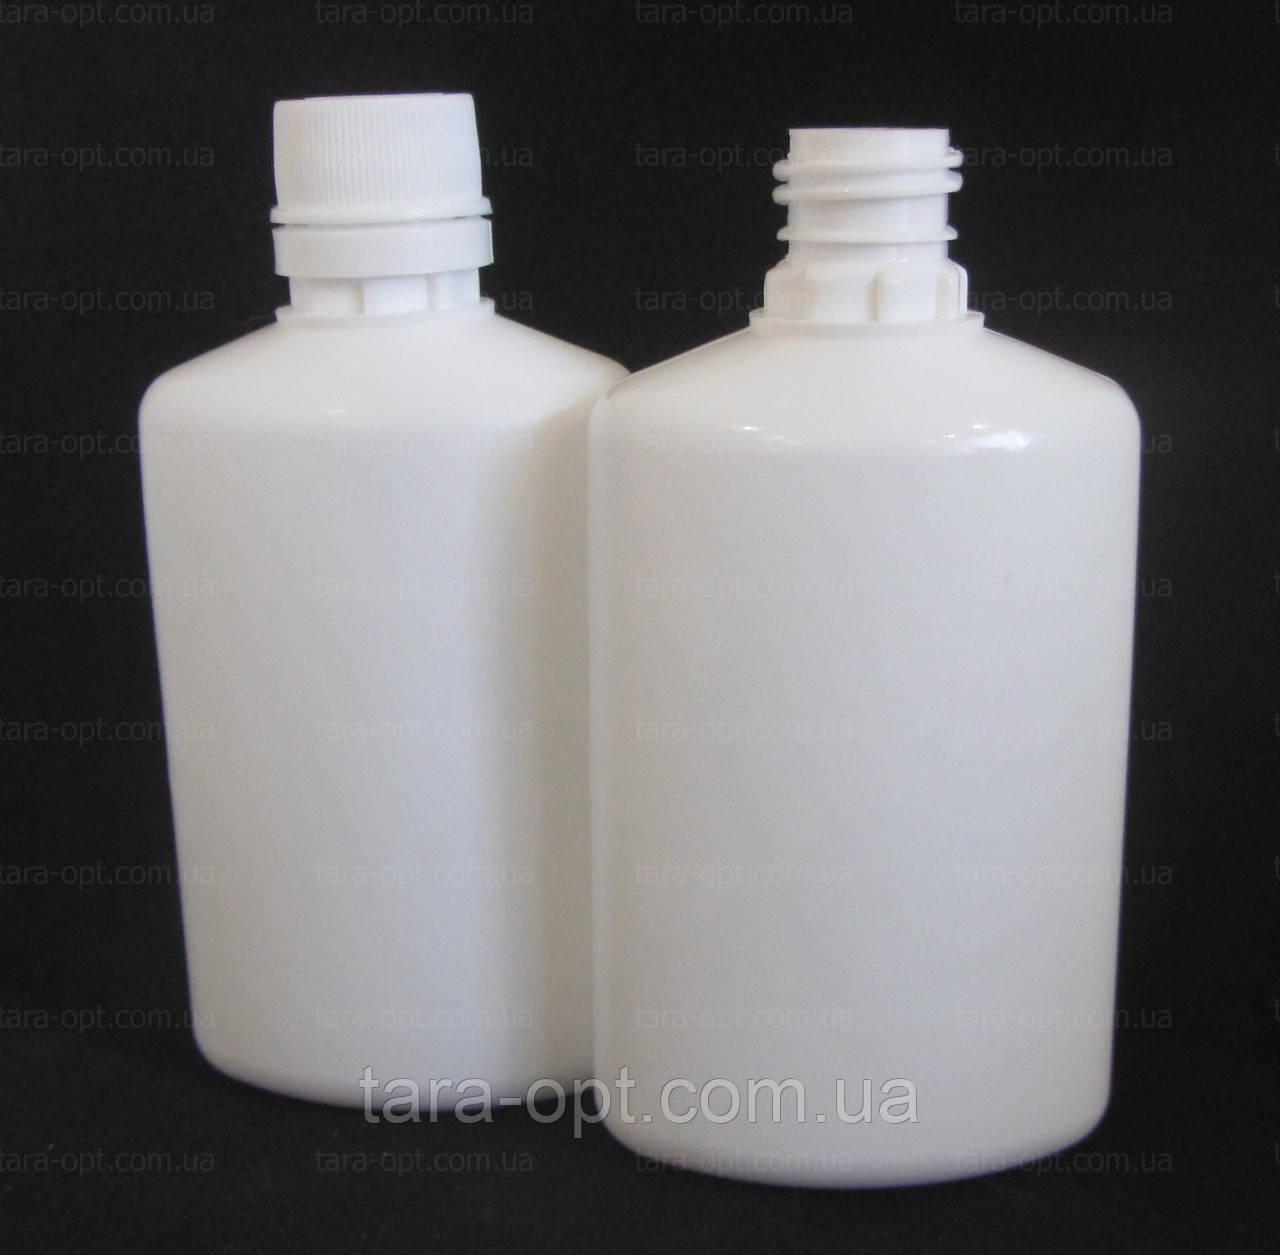 Флакон овальный 50 мл, белый, (Цена от 2,75 грн)*